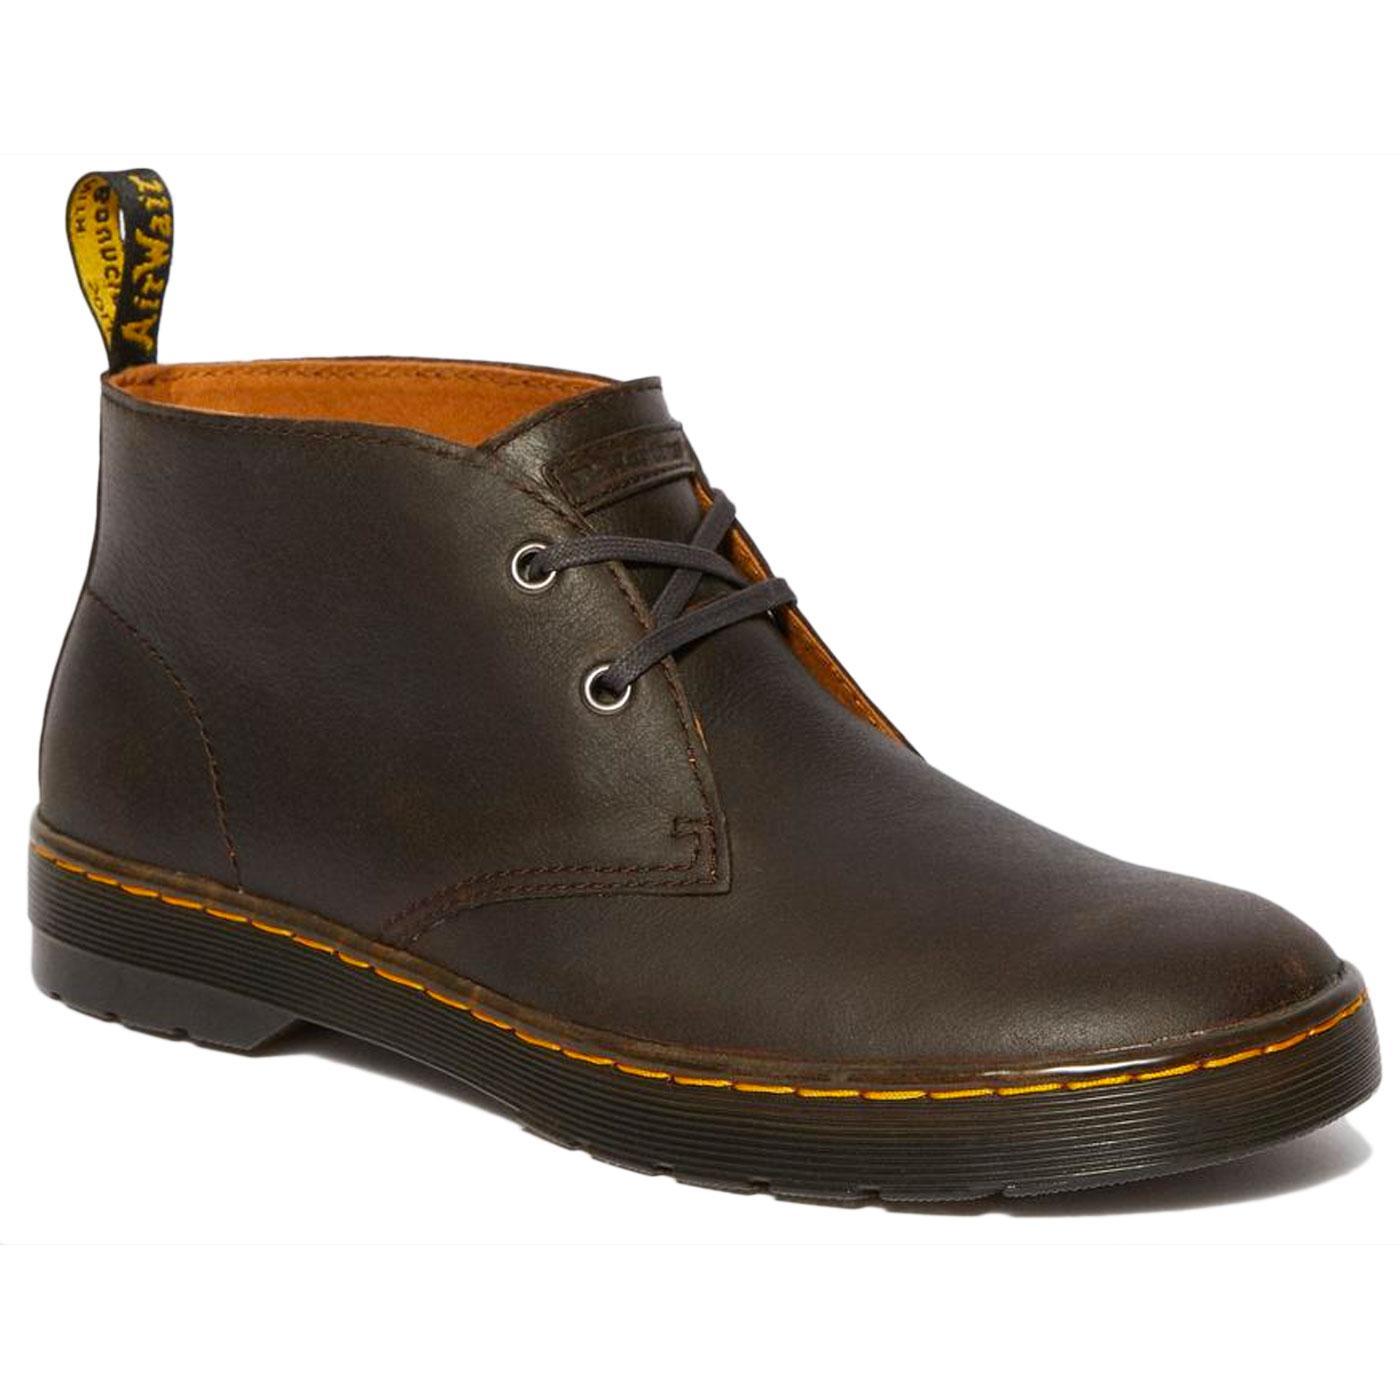 Cabrillo DR MARTENS Men's Retro Desert Boots ACORN